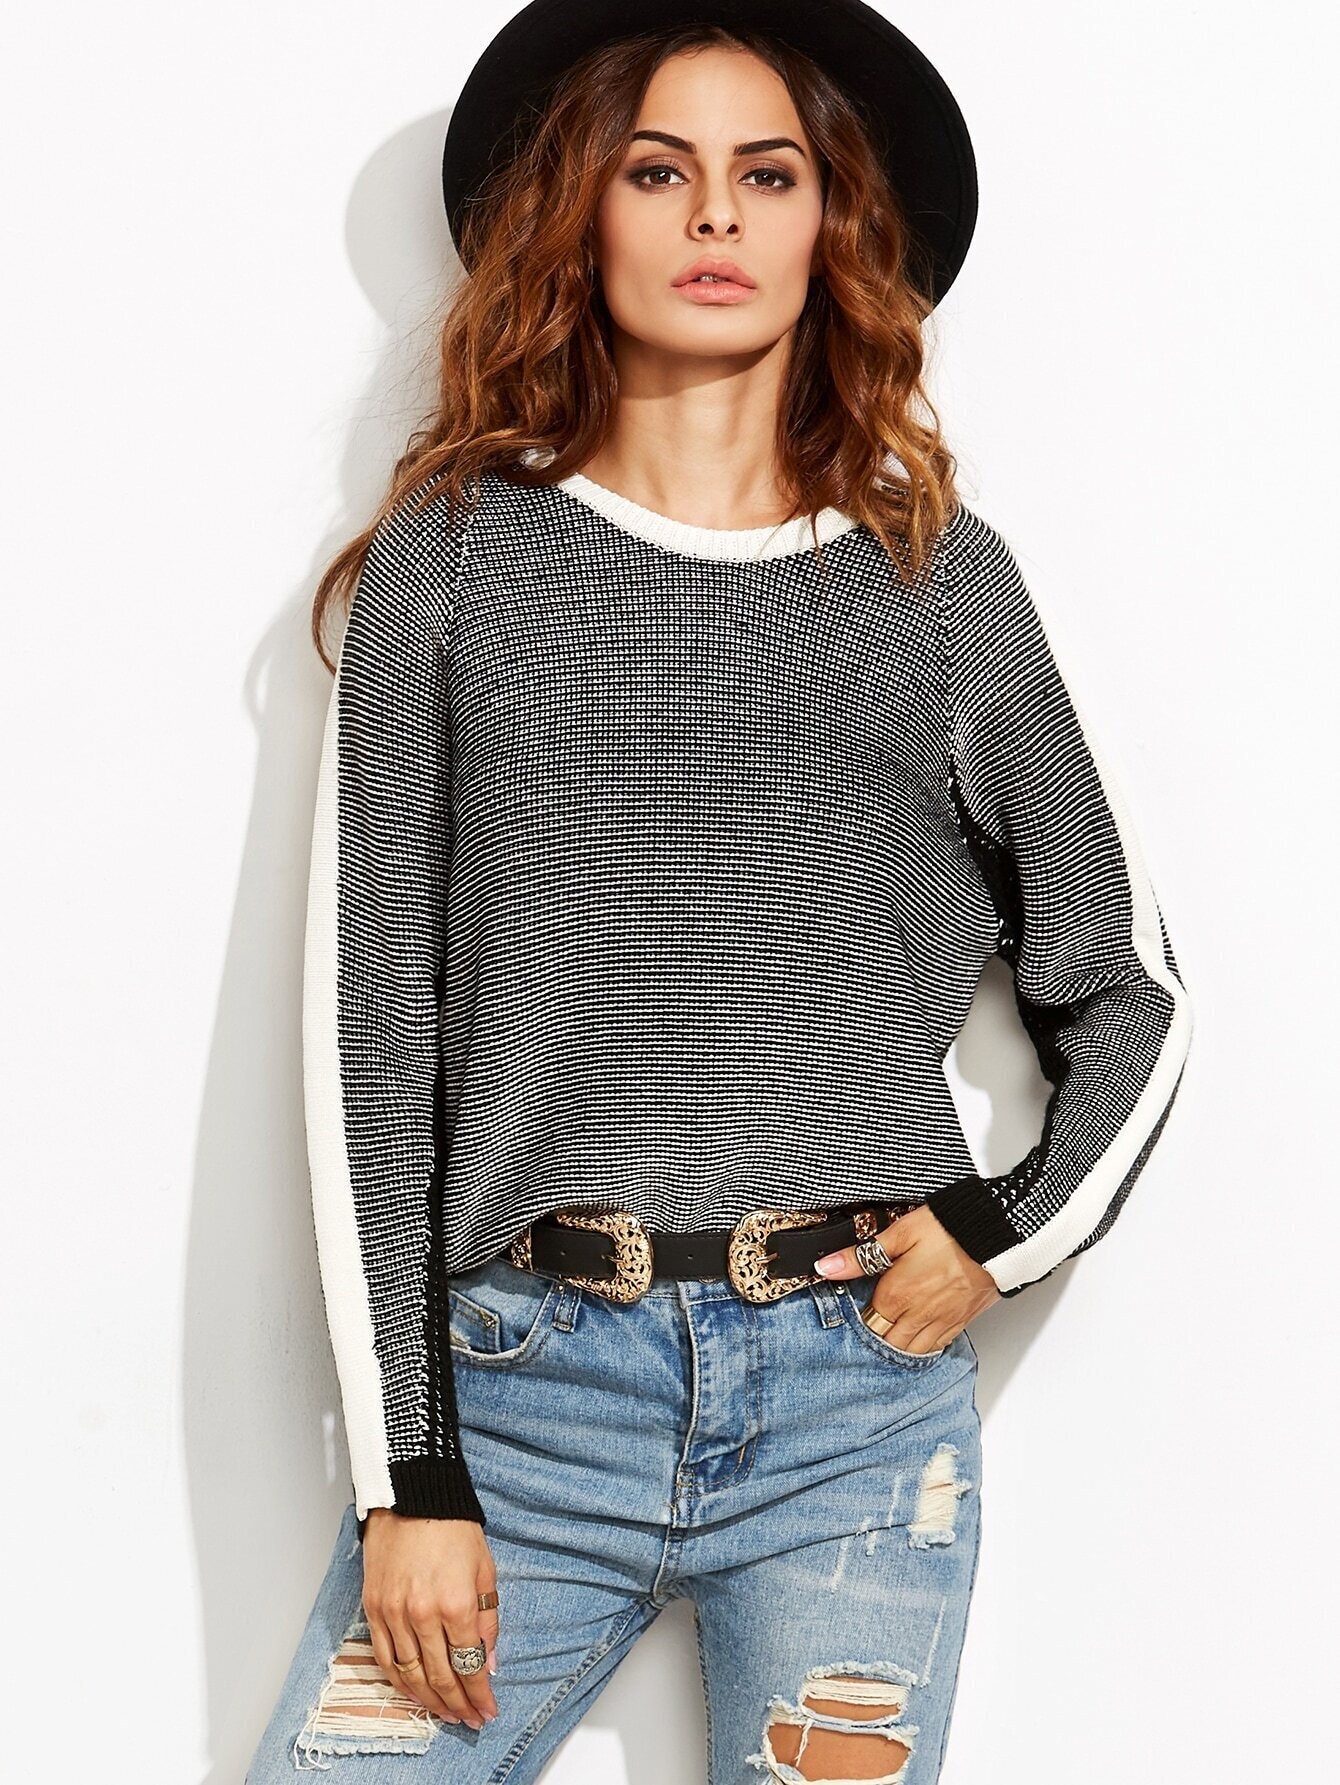 Black Contrast Trim Stripe Sleeve Raglan Sweater sweater160809707